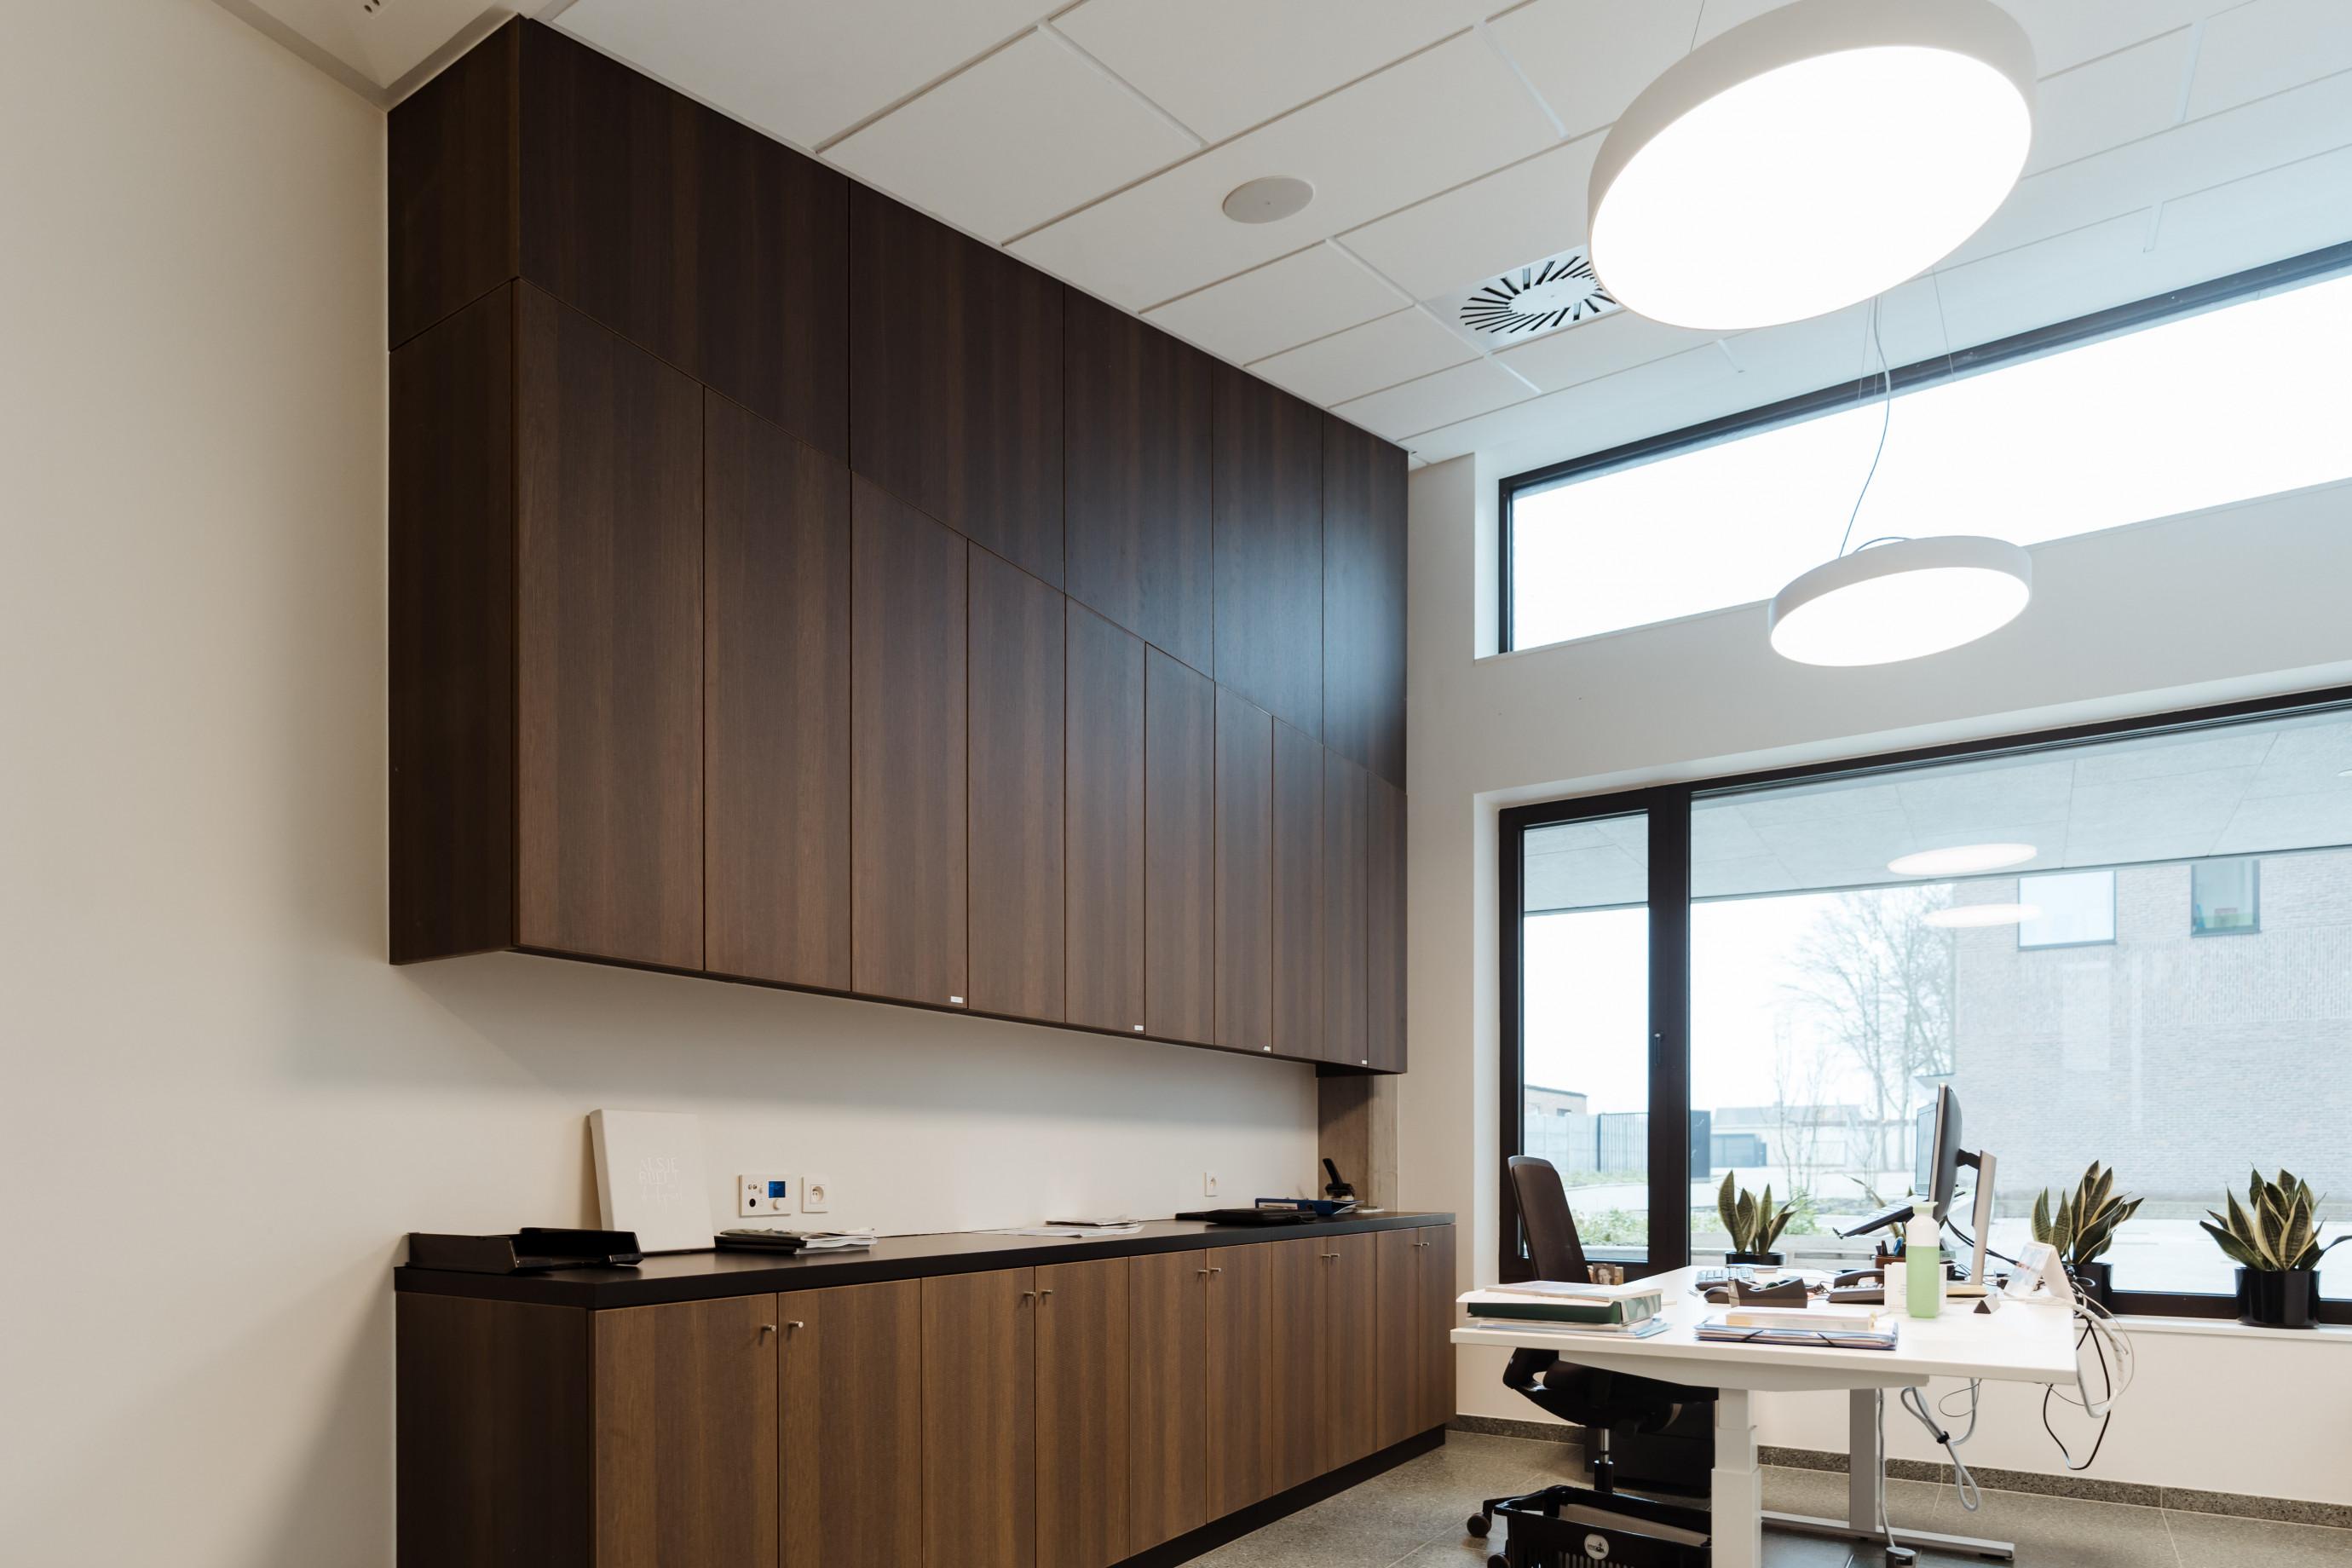 Acoustic cabinet